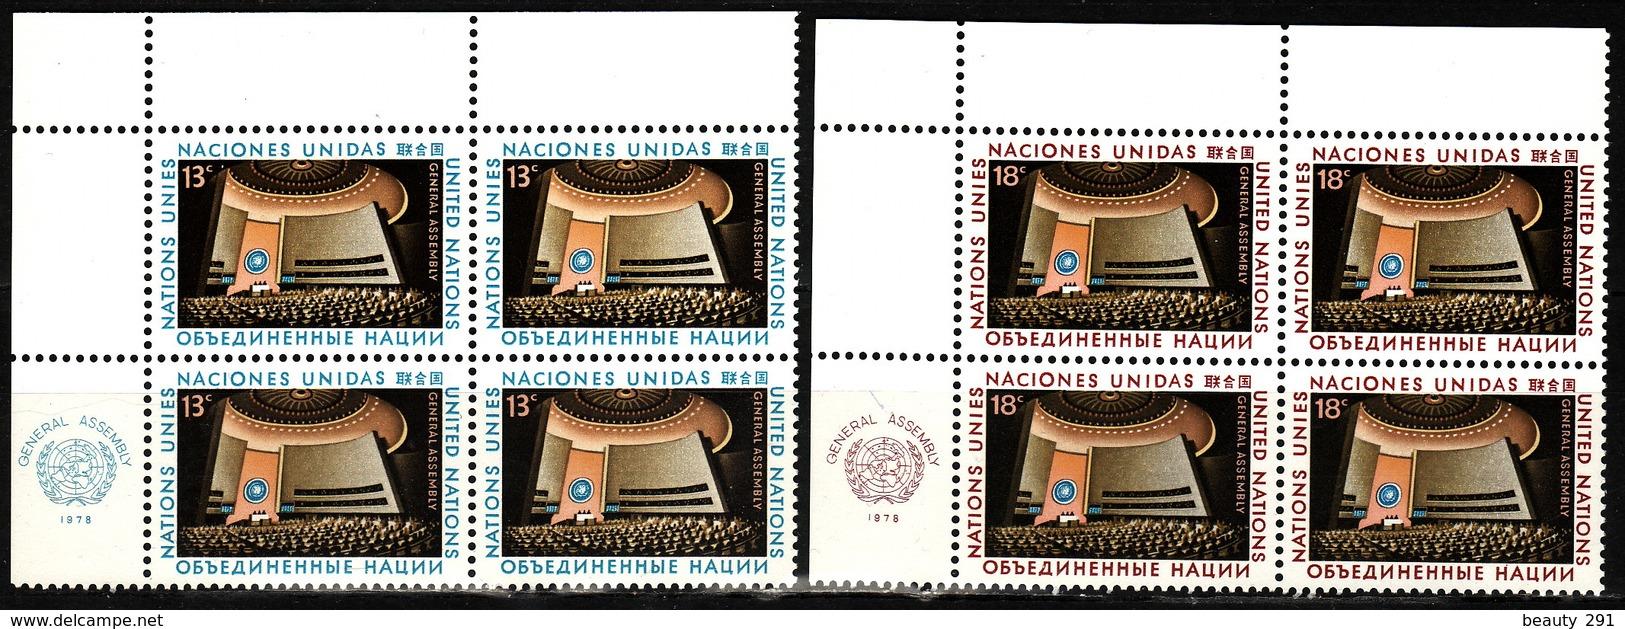 UN NEW YORK - 1978 - Mi 324-325 - BLOCK OF 4 - MNH** VF - New York -  VN Hauptquartier